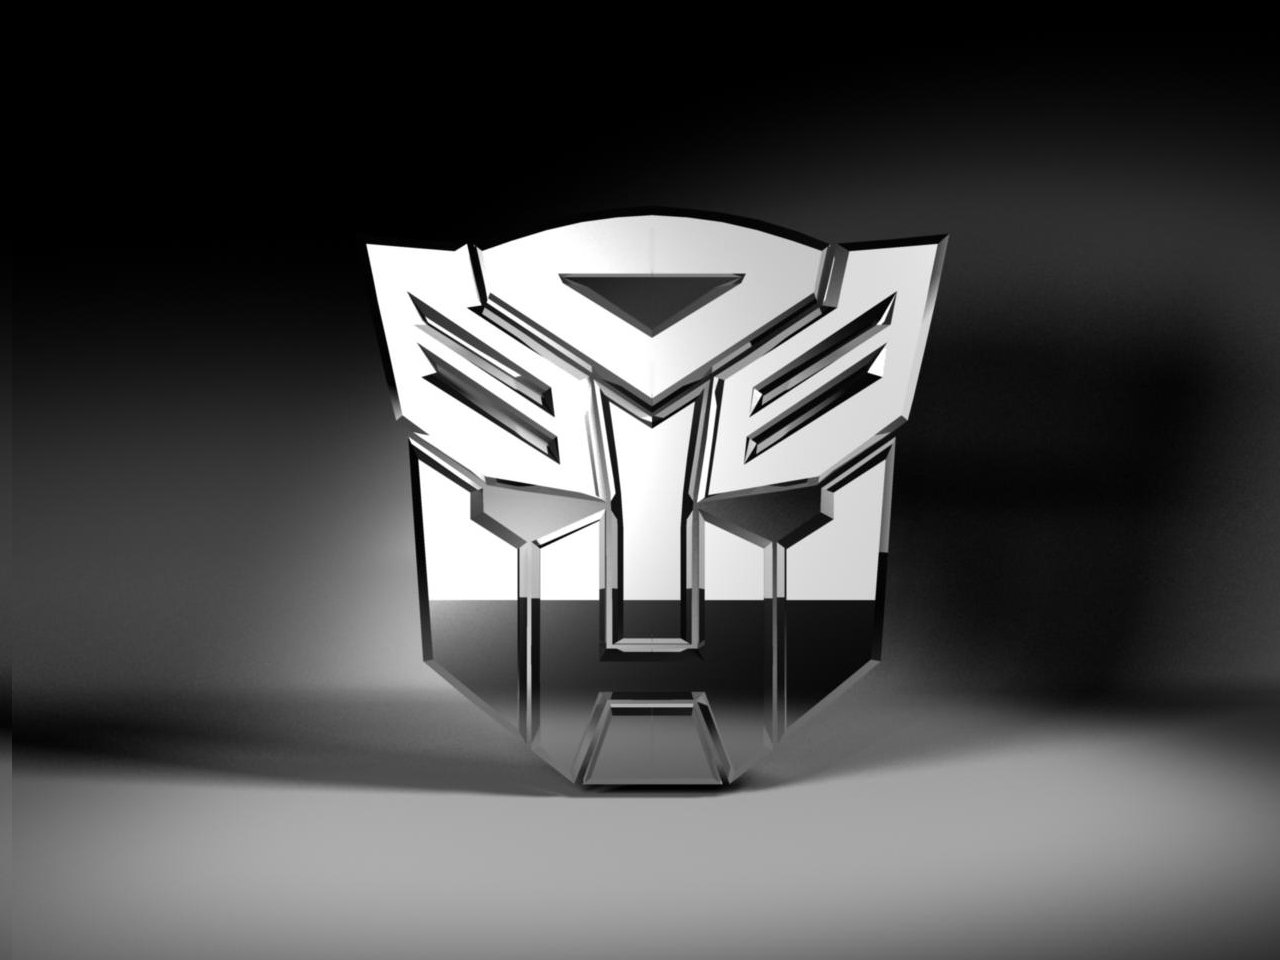 Transformers Autobots Logo 3d Model In Special Effects 3dexport